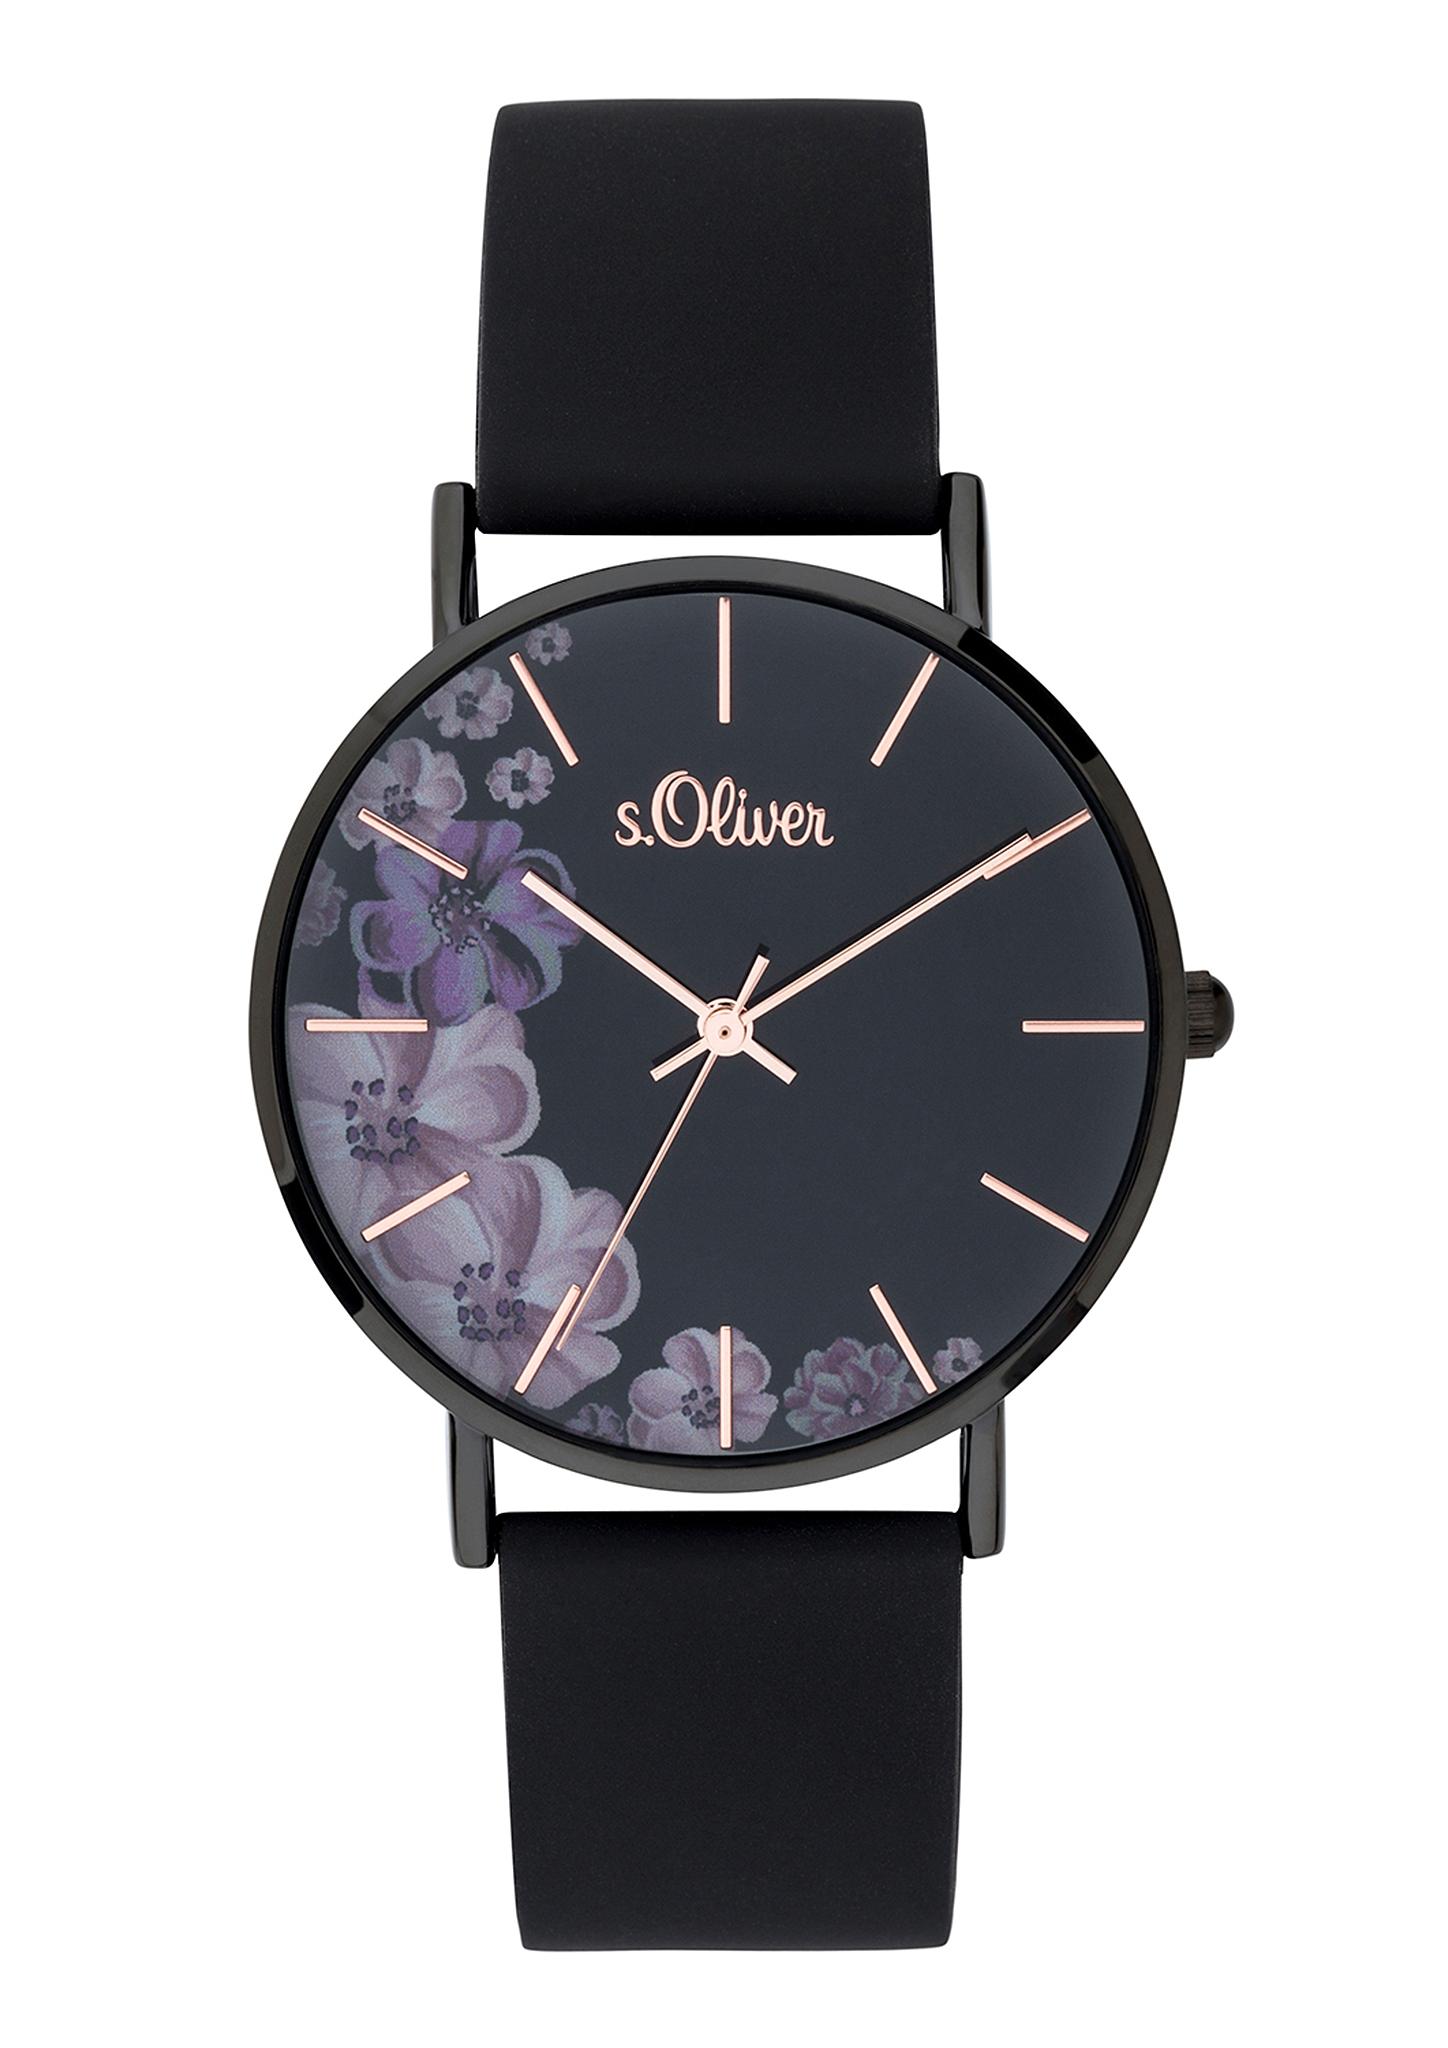 Armbanduhr | Uhren > Sonstige Armbanduhren | Grau/schwarz | Metall| mineralglas| silikon| edelstahl | s.Oliver